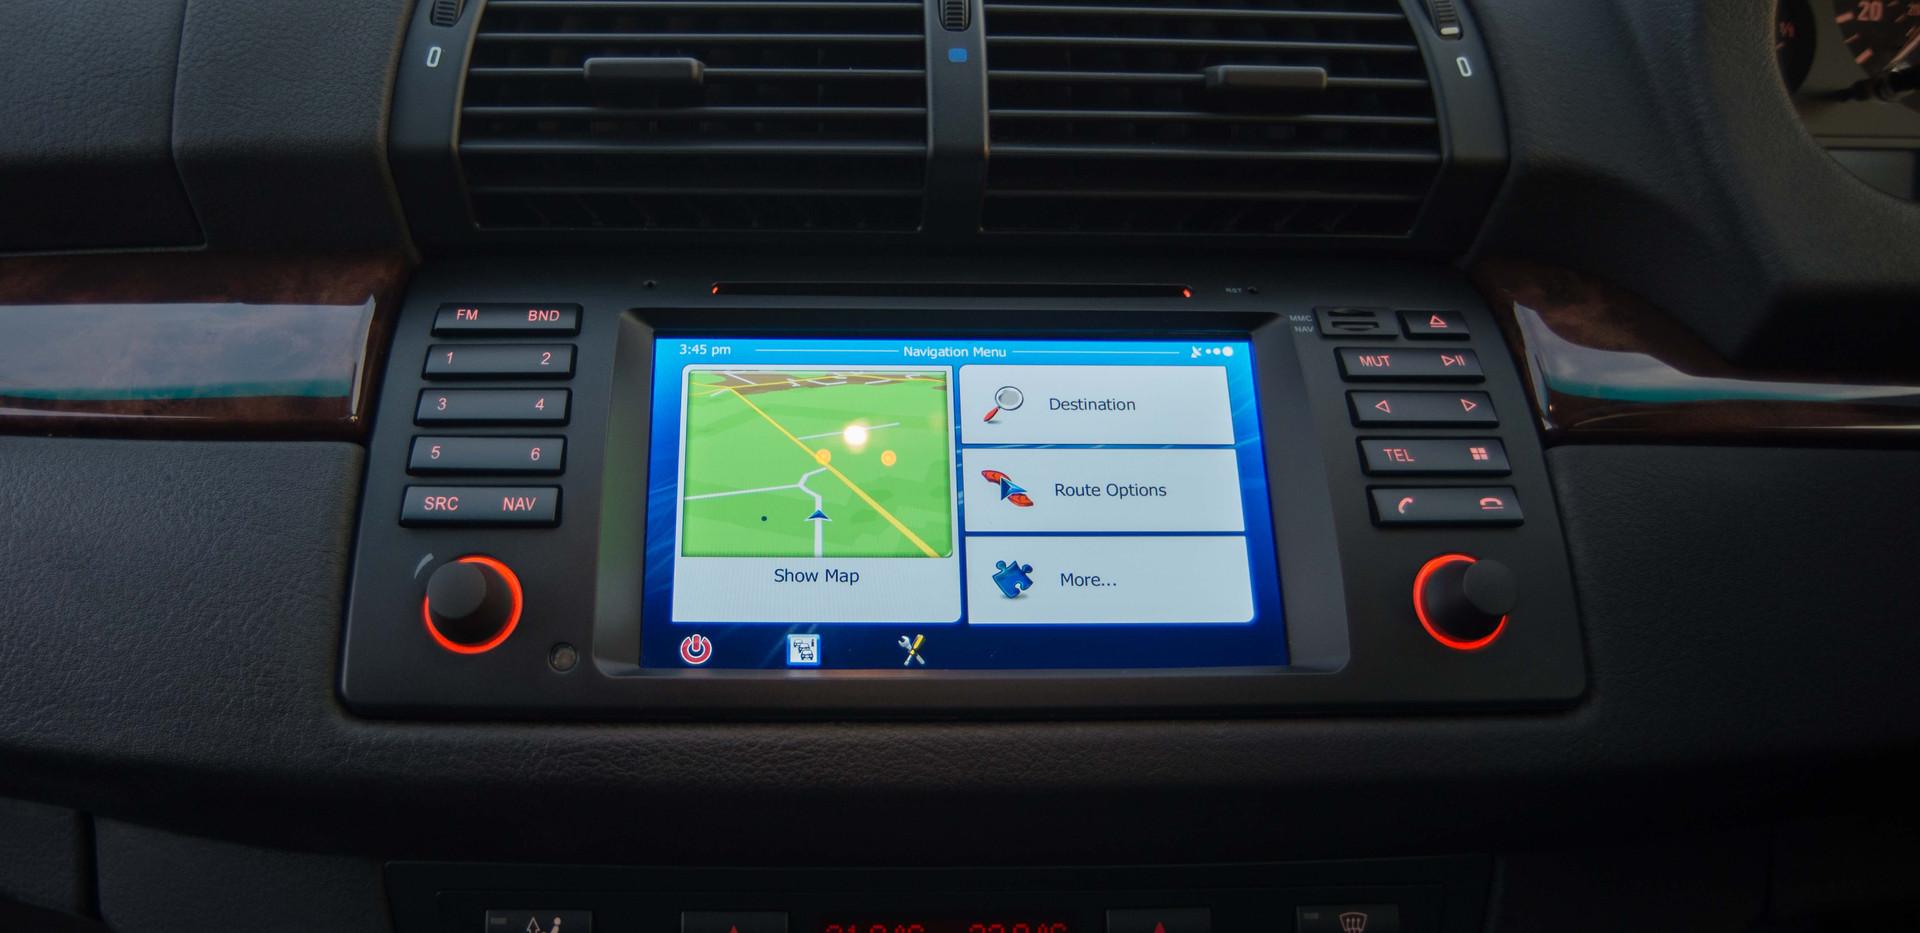 BMW E53 X5 4.4i For Sale UK London  (16